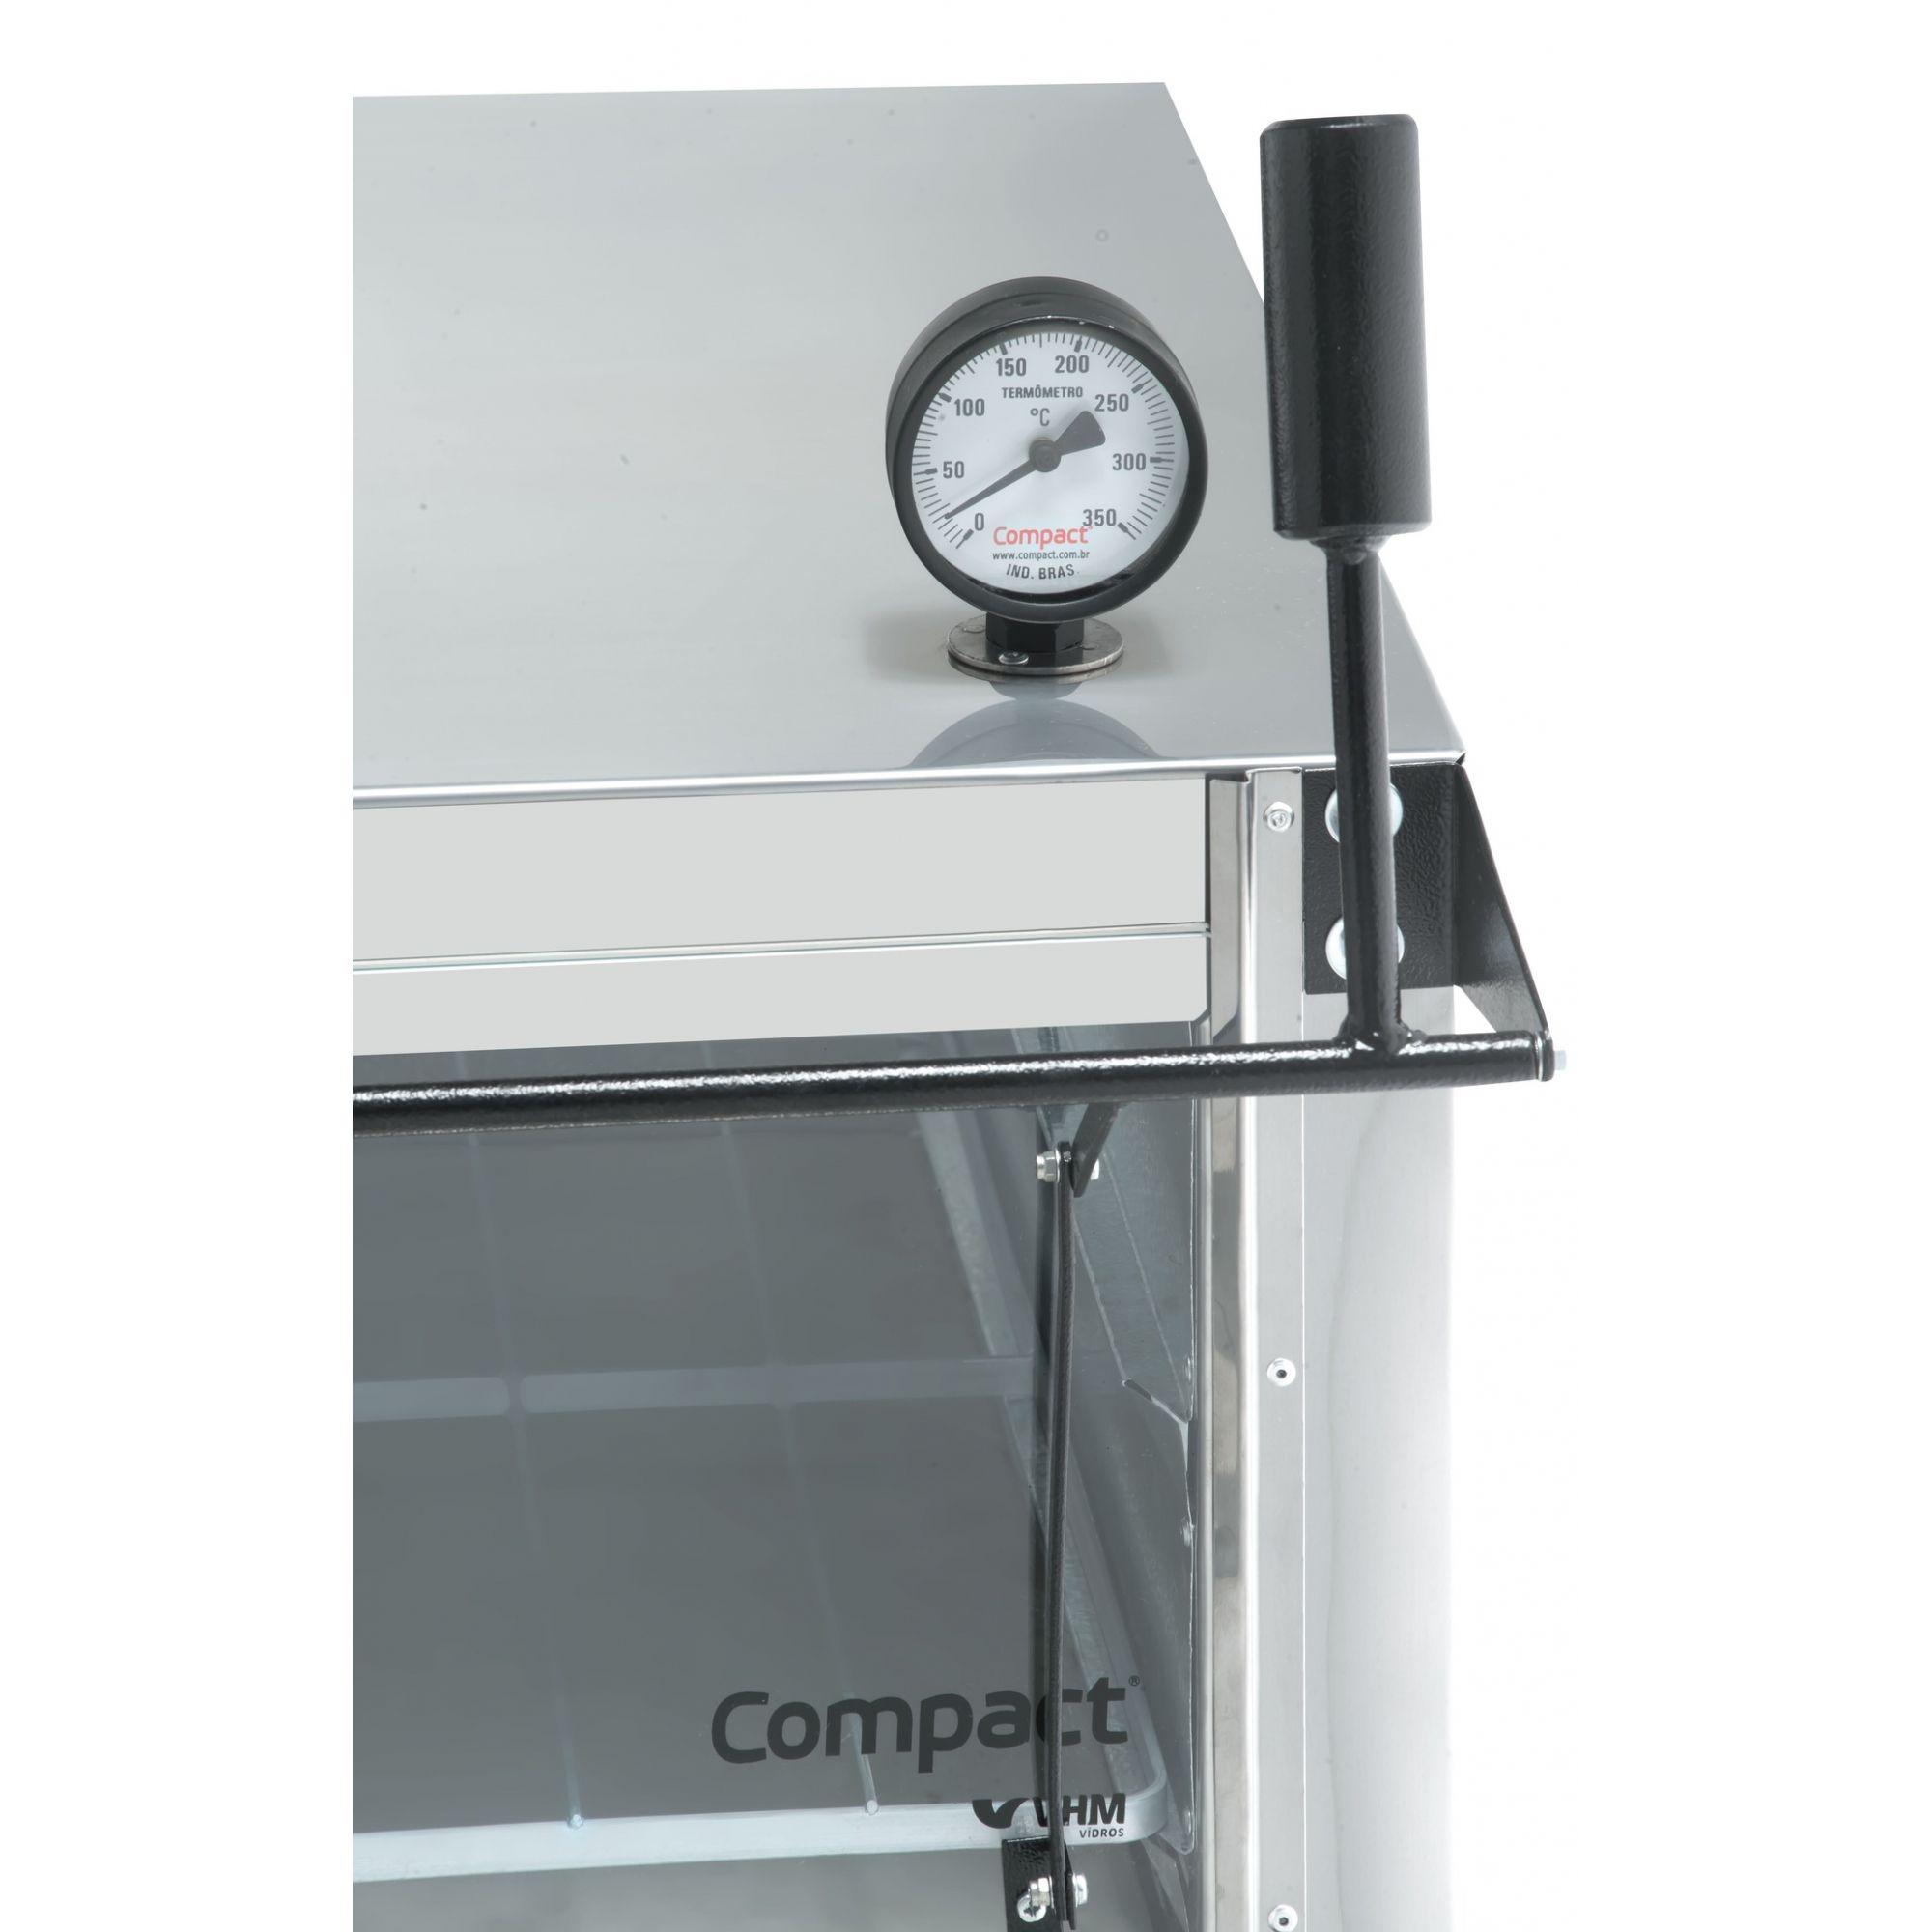 Forno de Lastro a Gás em Inox Compact - FL900  - Carmel Equipamentos